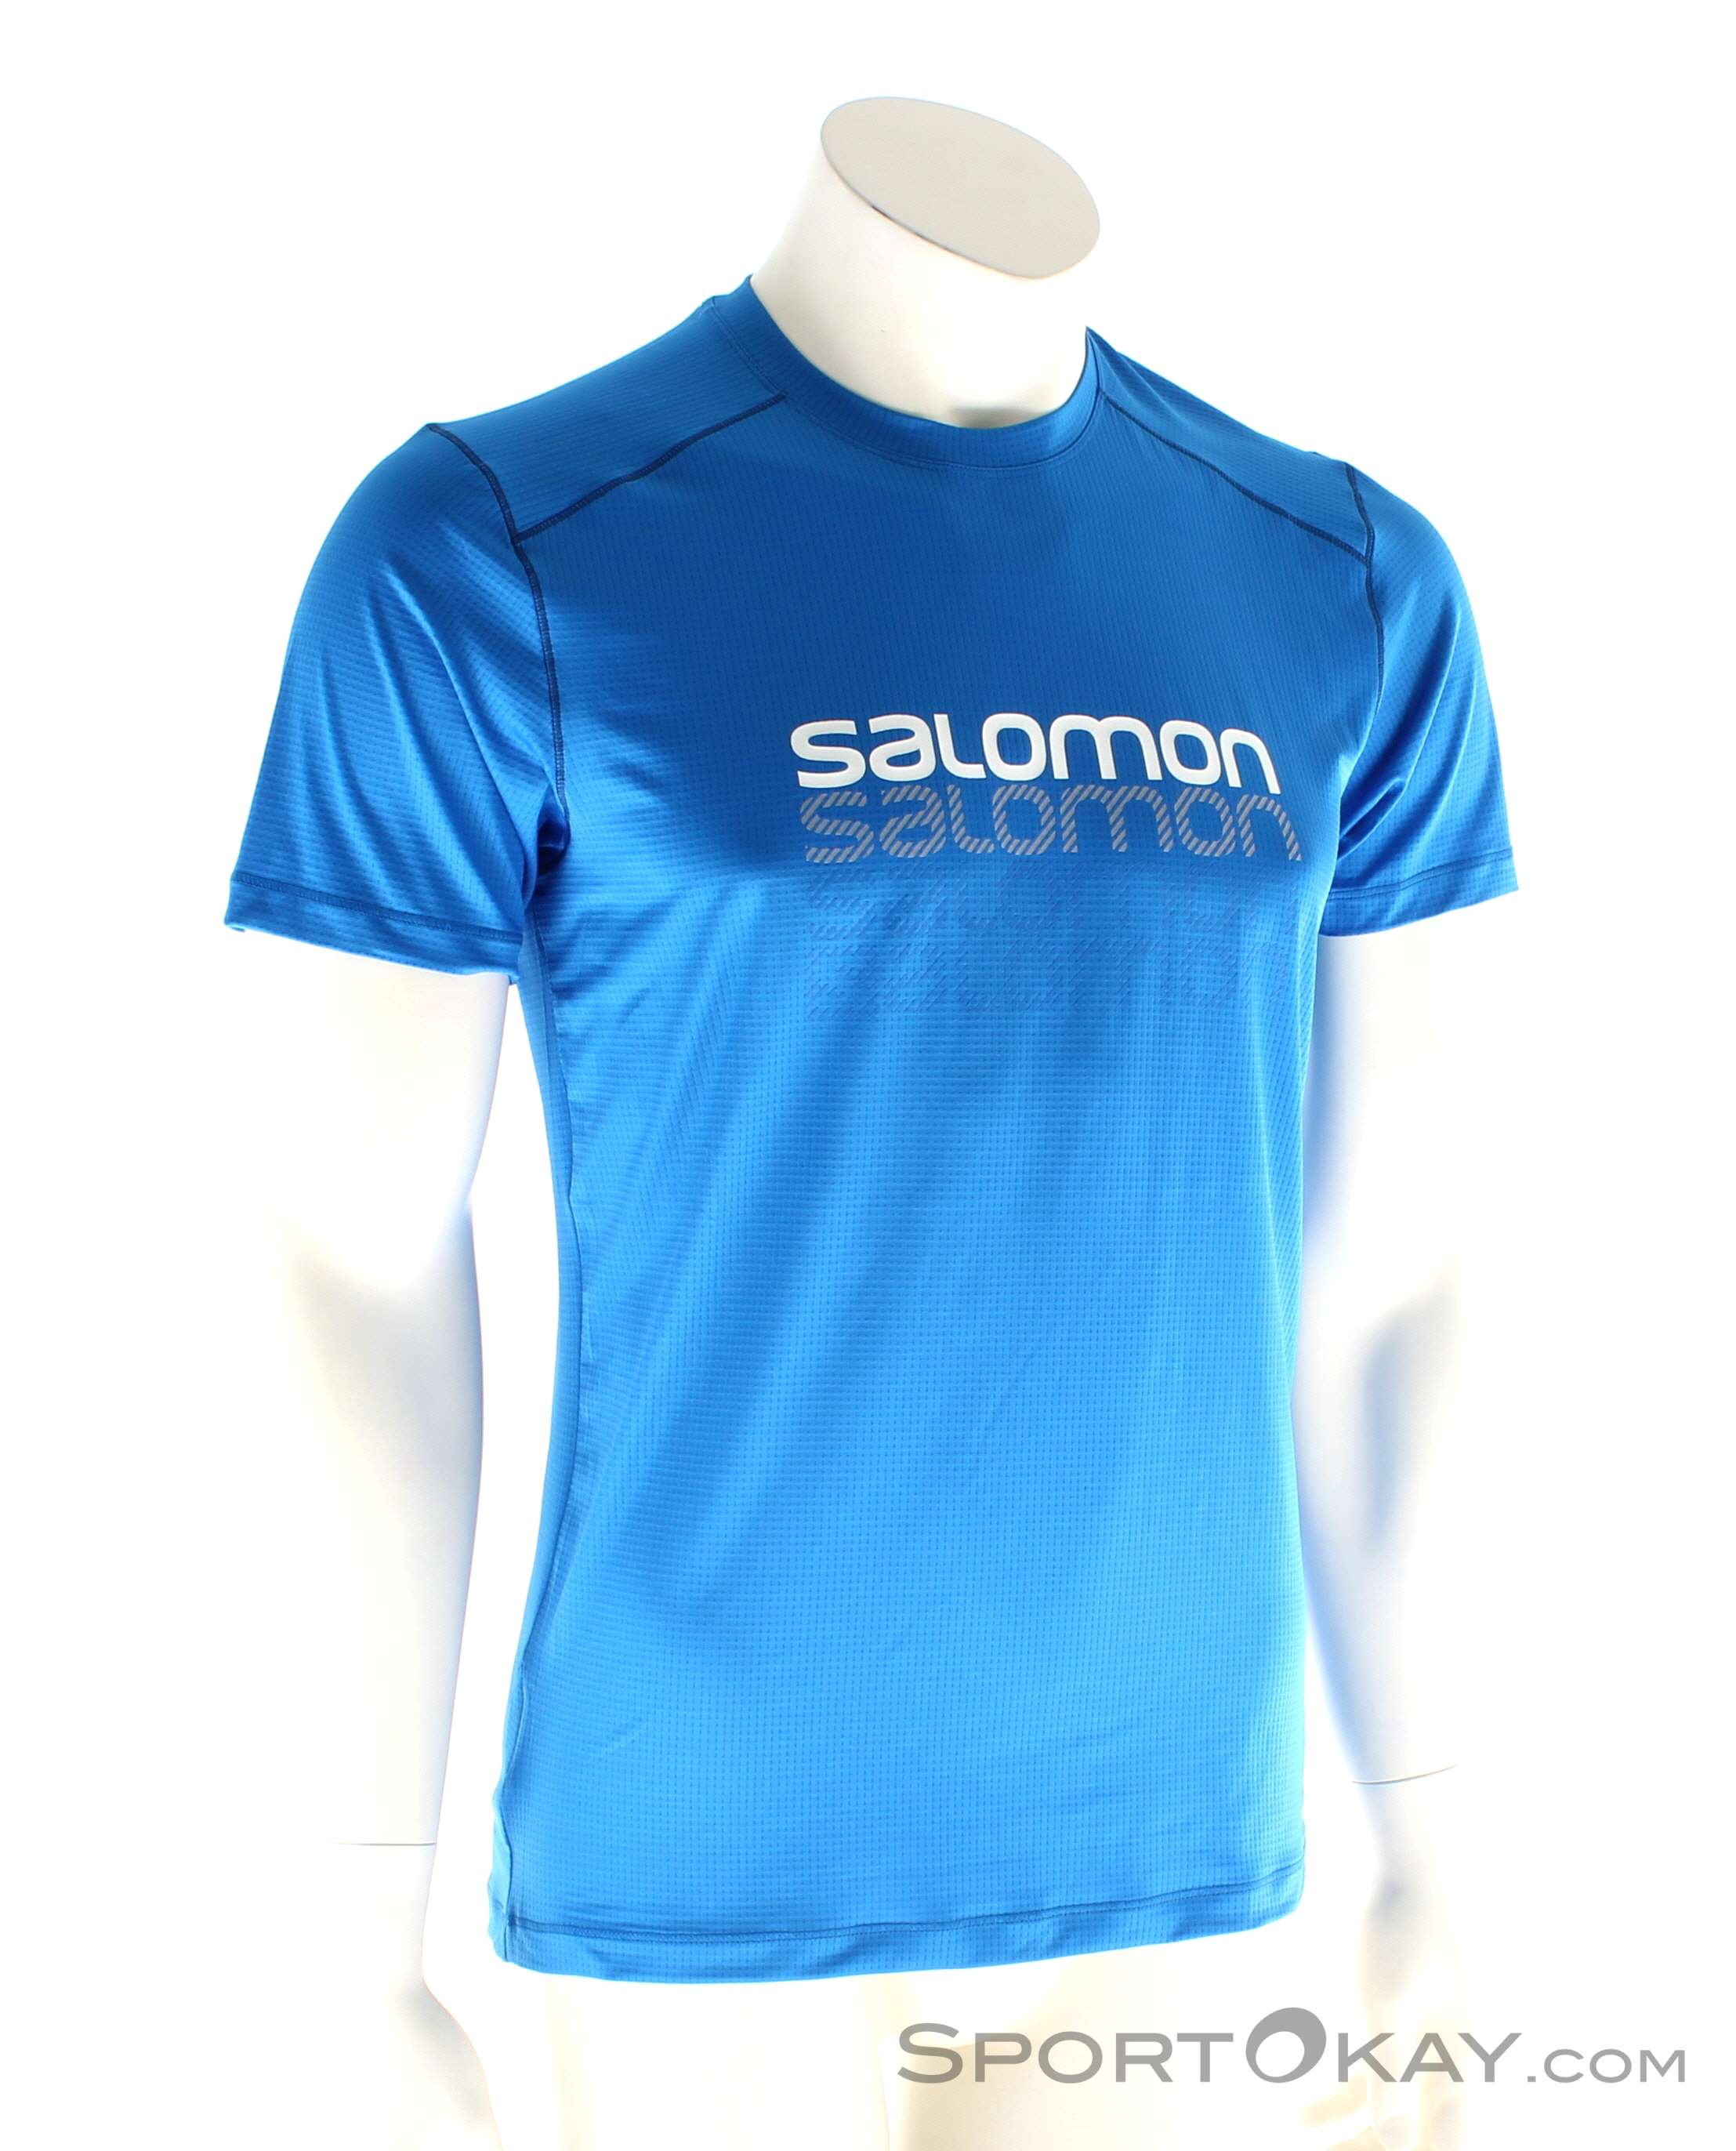 Salomon Cosmic SS Tee Mens T-Shirt - Shirts   T-Shirts - Outdoor ... 0adfbff11